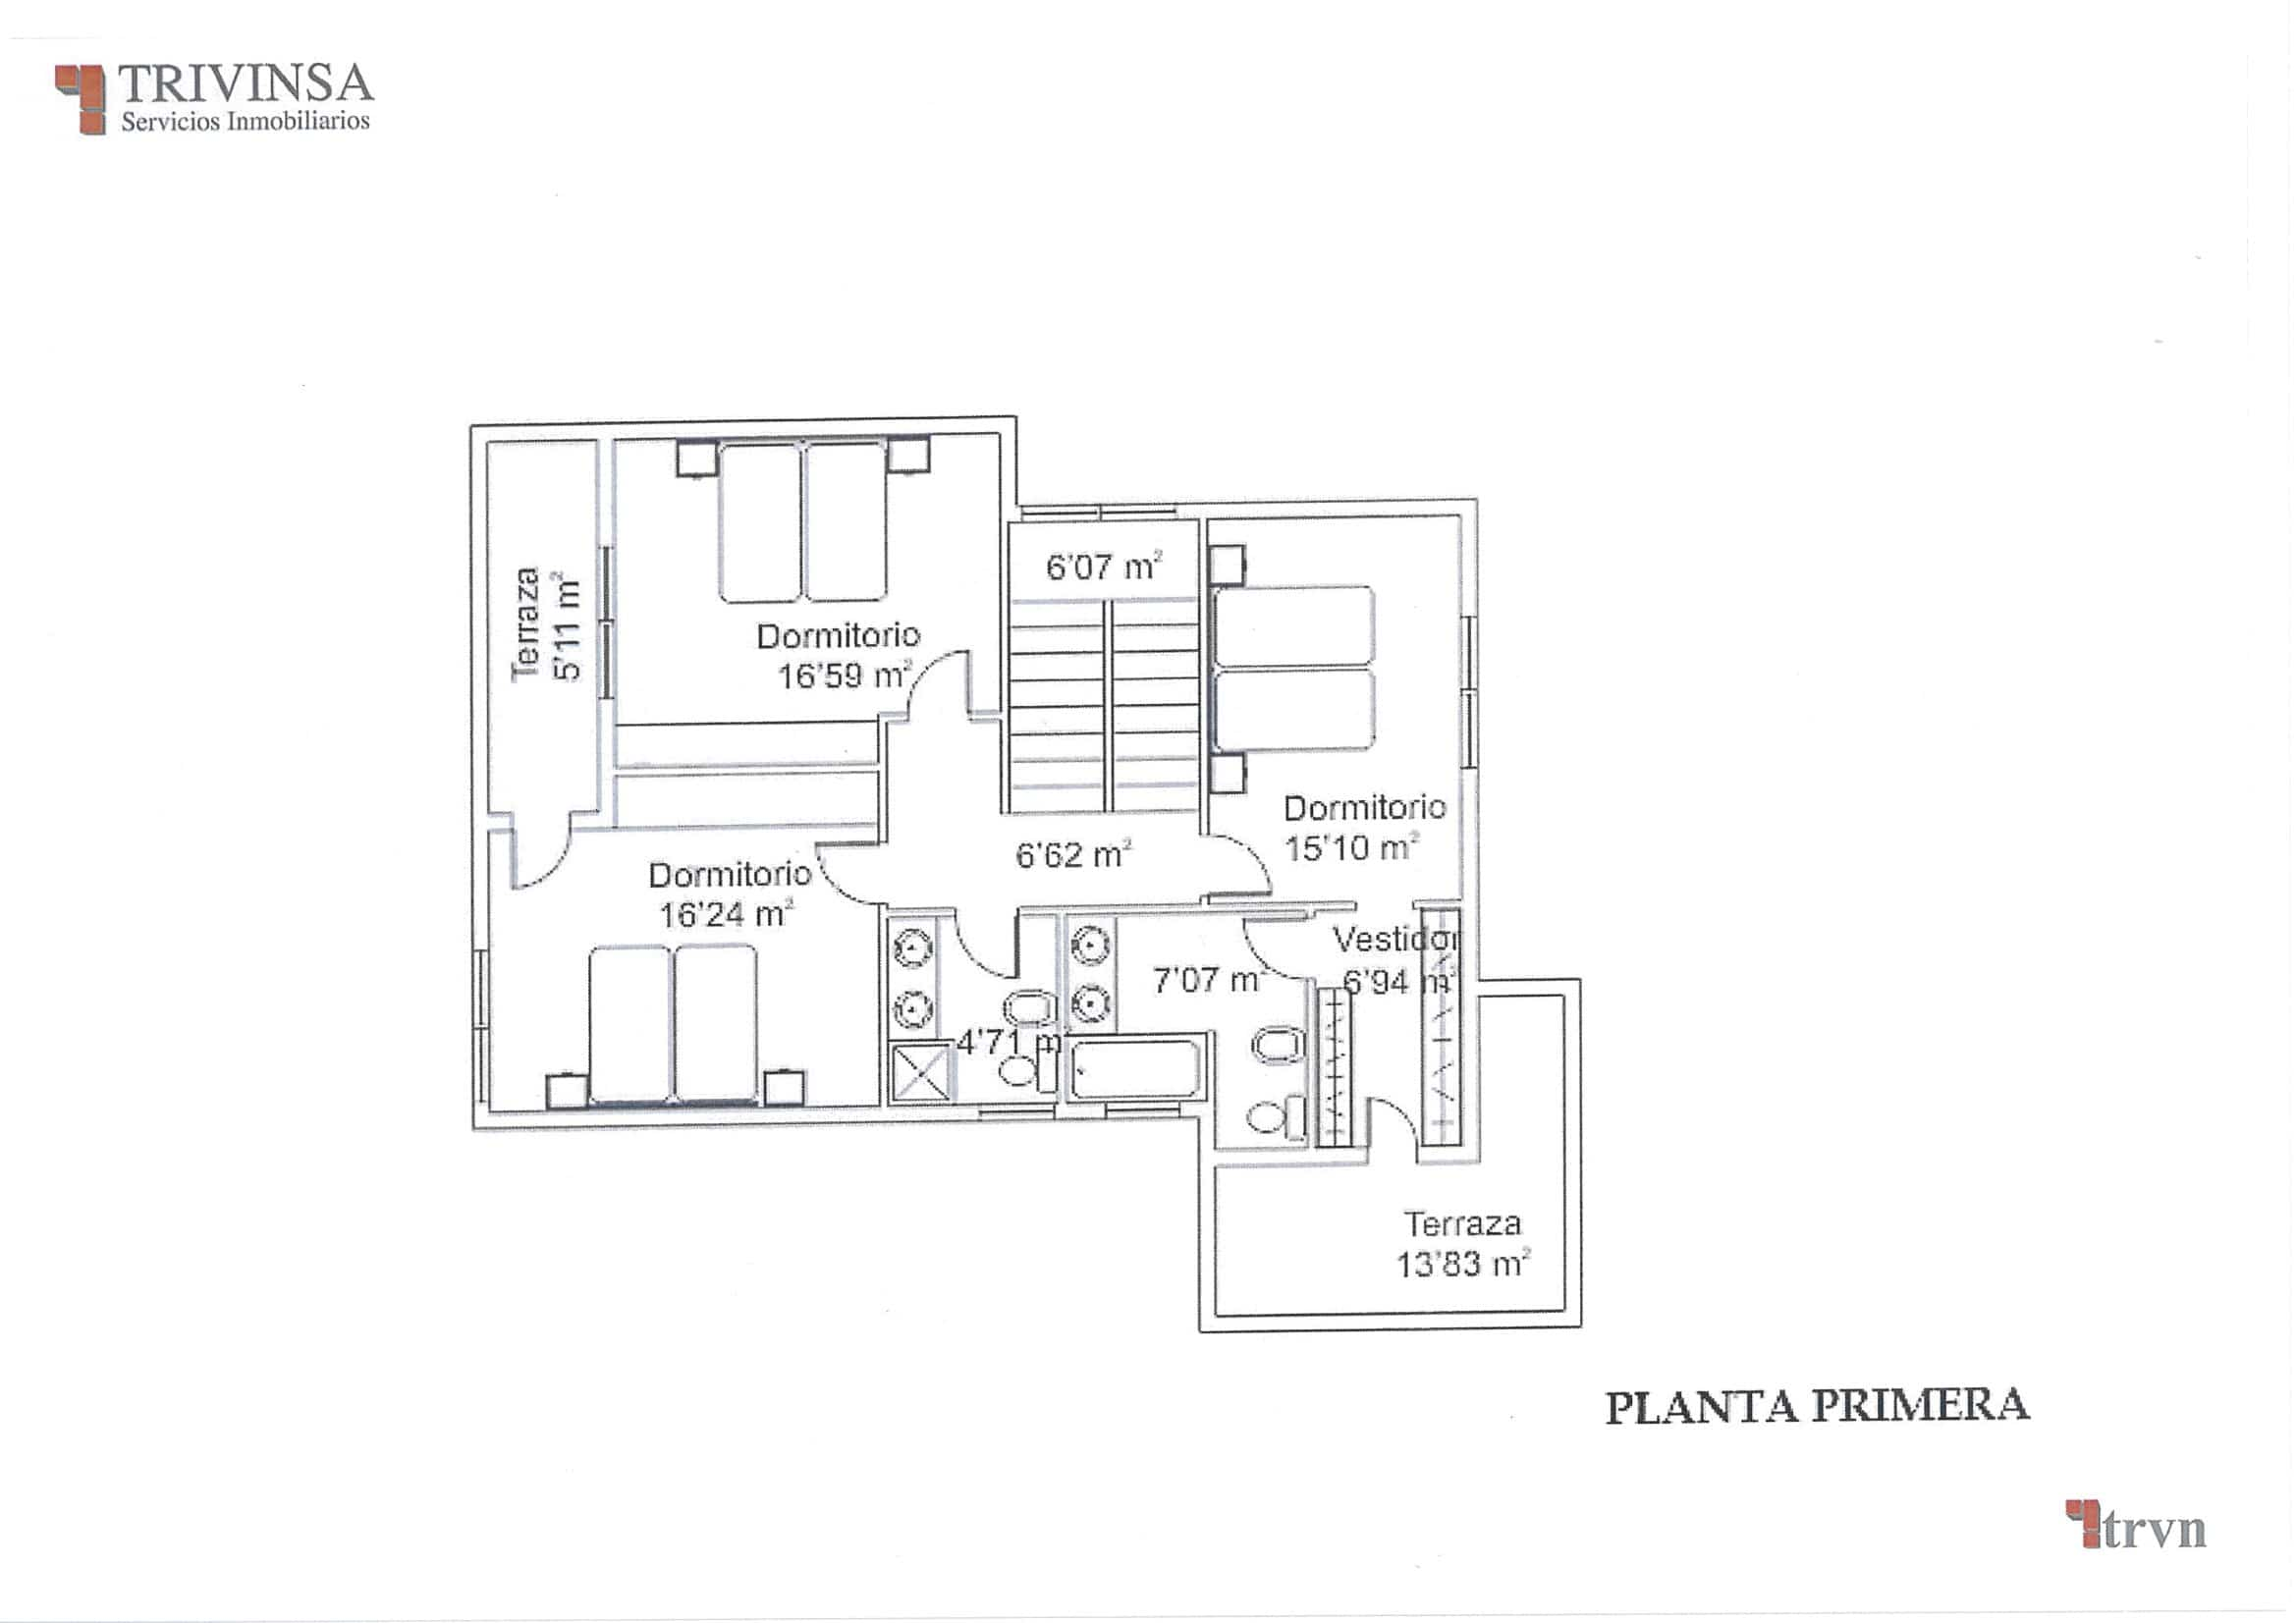 C03544-COTAS PLANTA PRIMERA